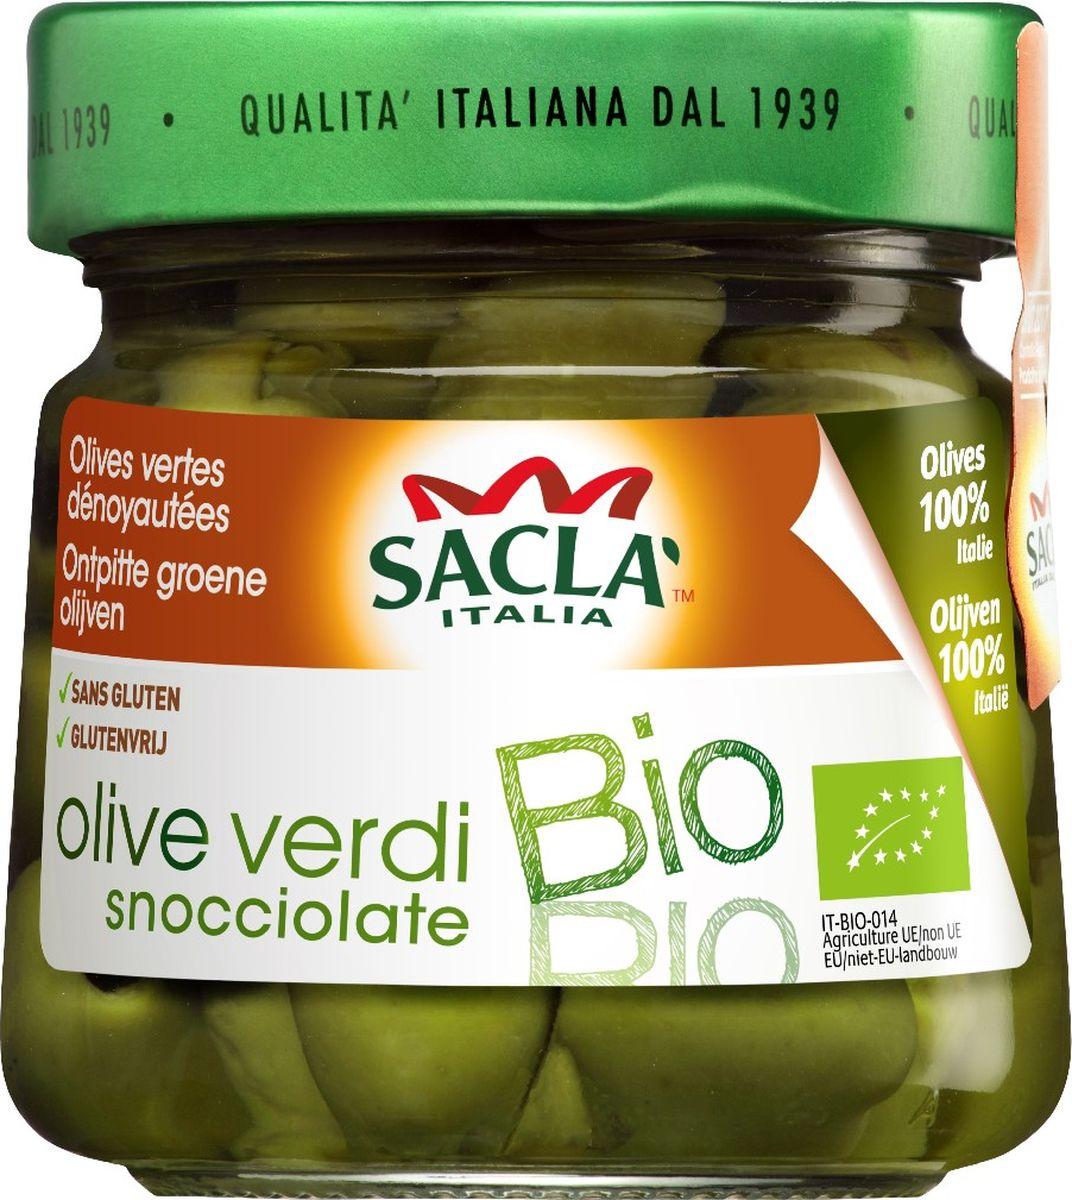 Sacla Био оливки зеленые без косточки, 185 г250254Оливки зеленые биологические без косточек.